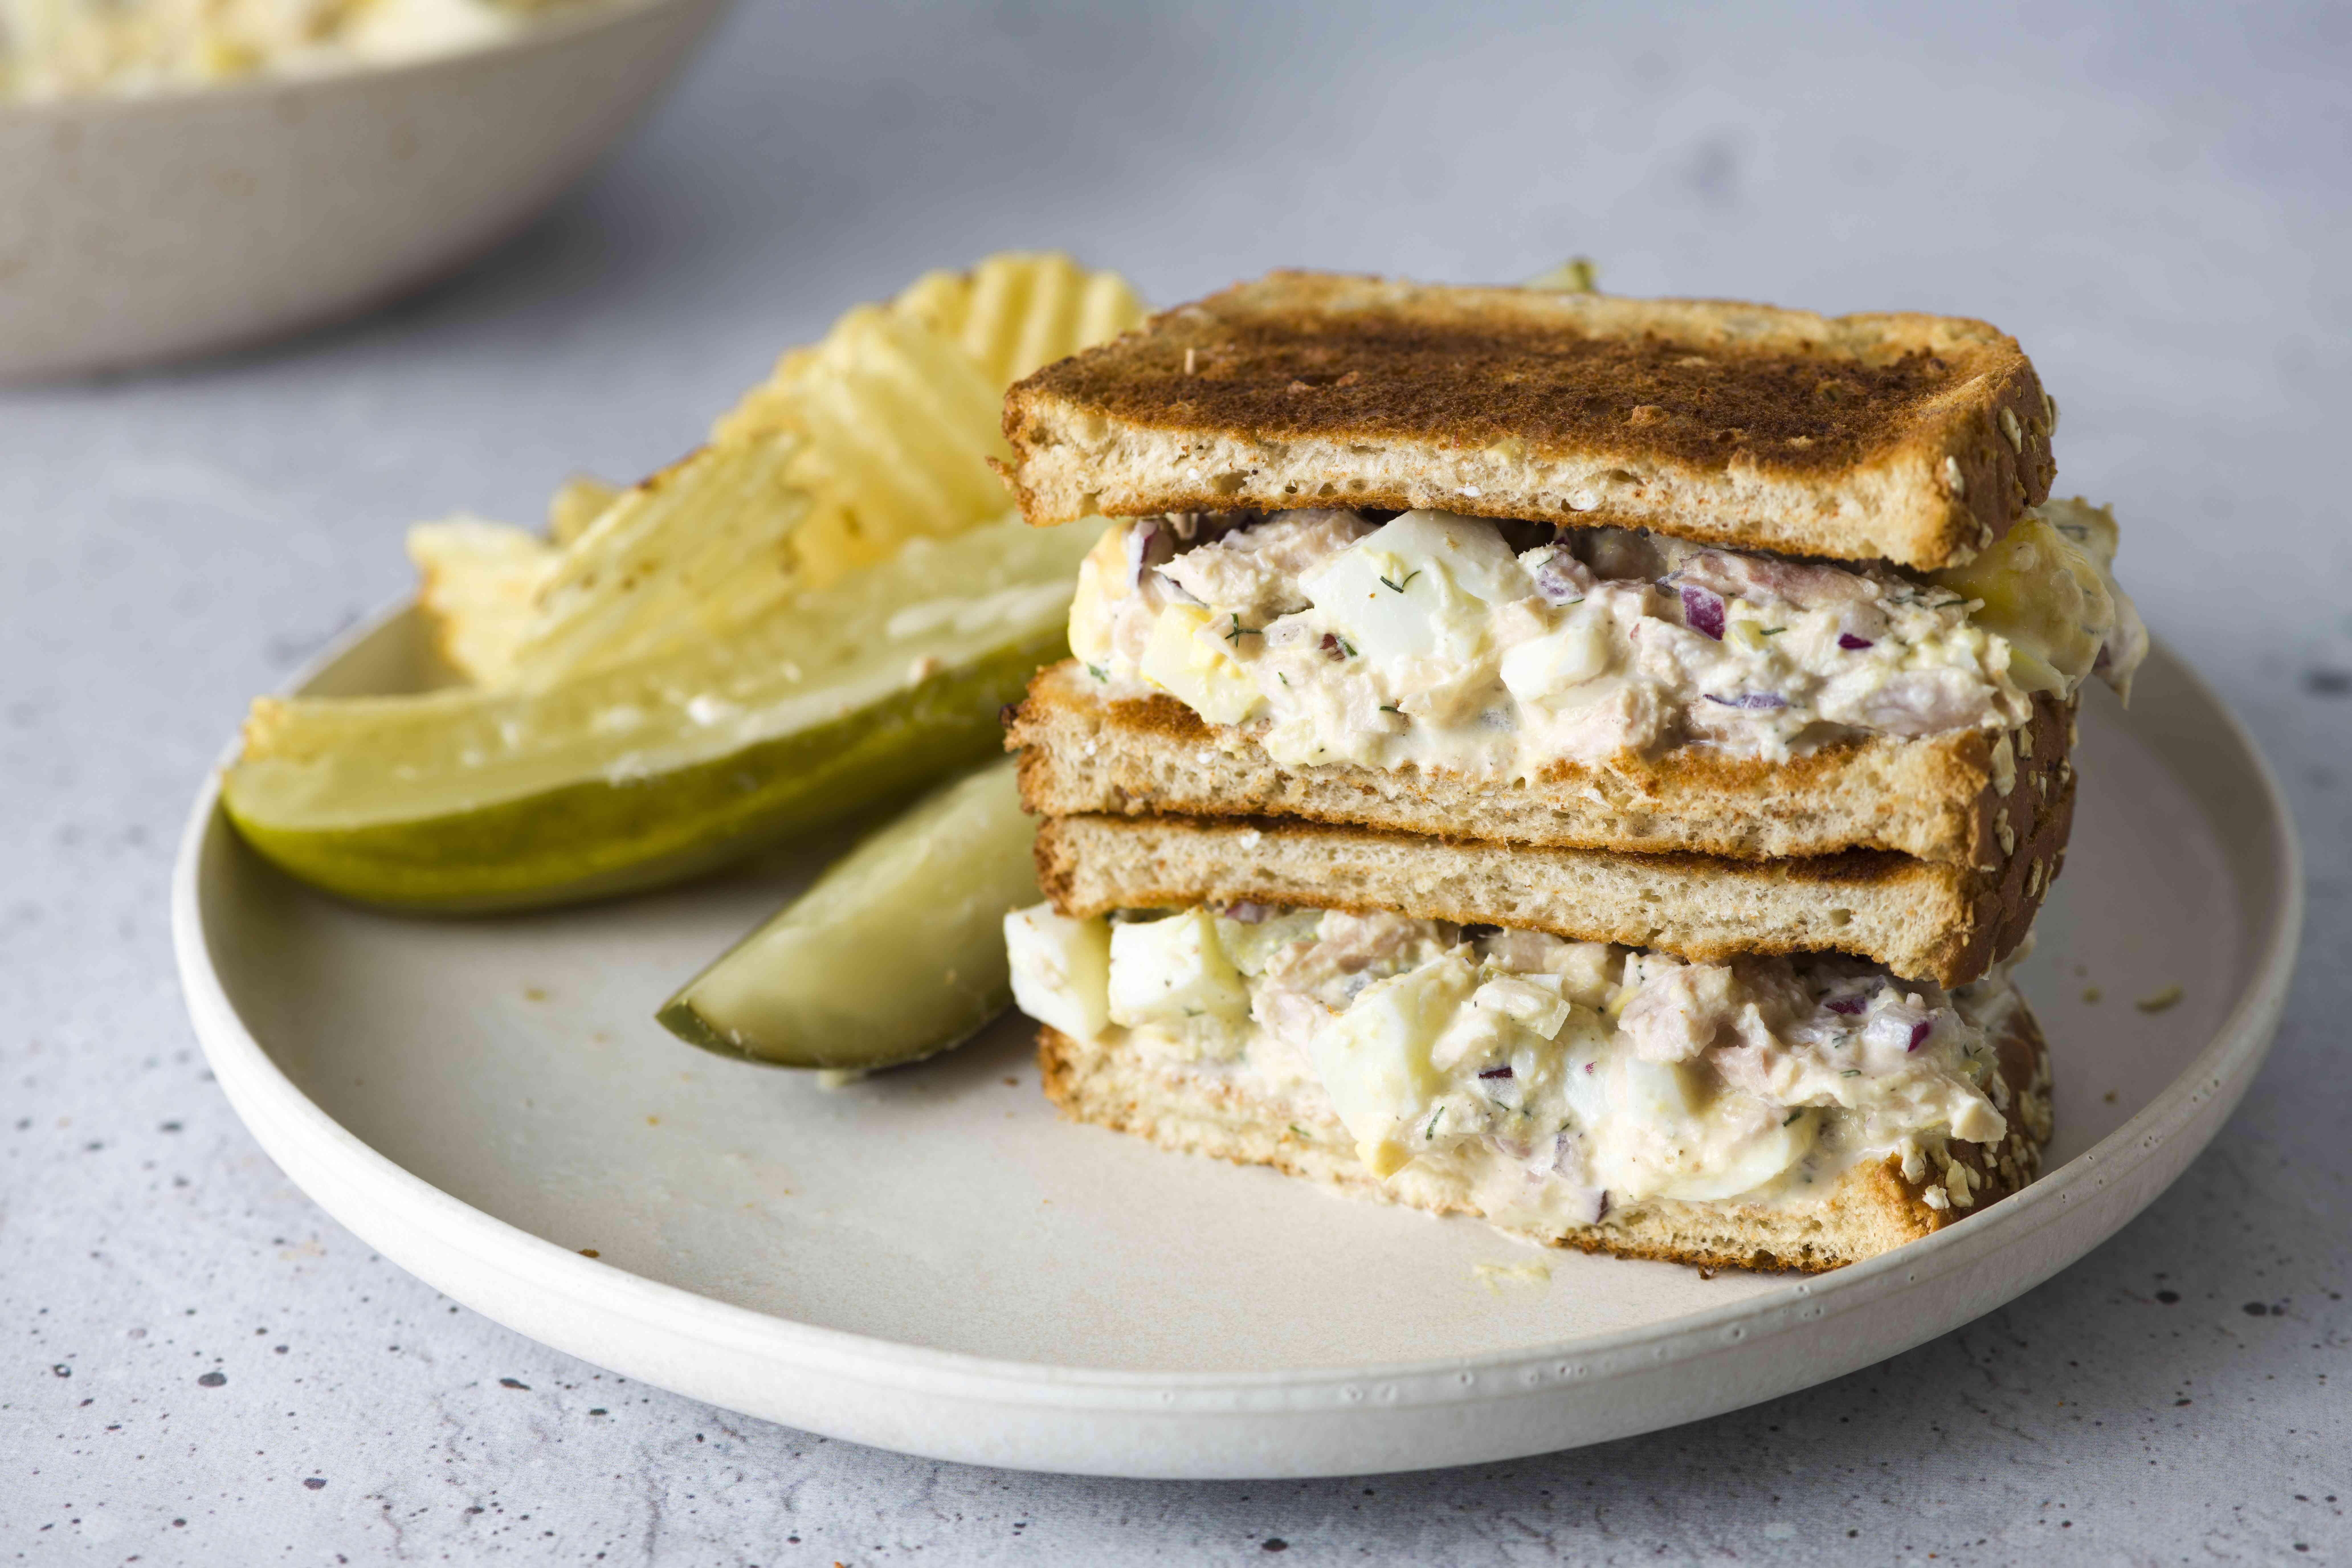 Eggs and Dill Tuna Salad sandwich on a plate